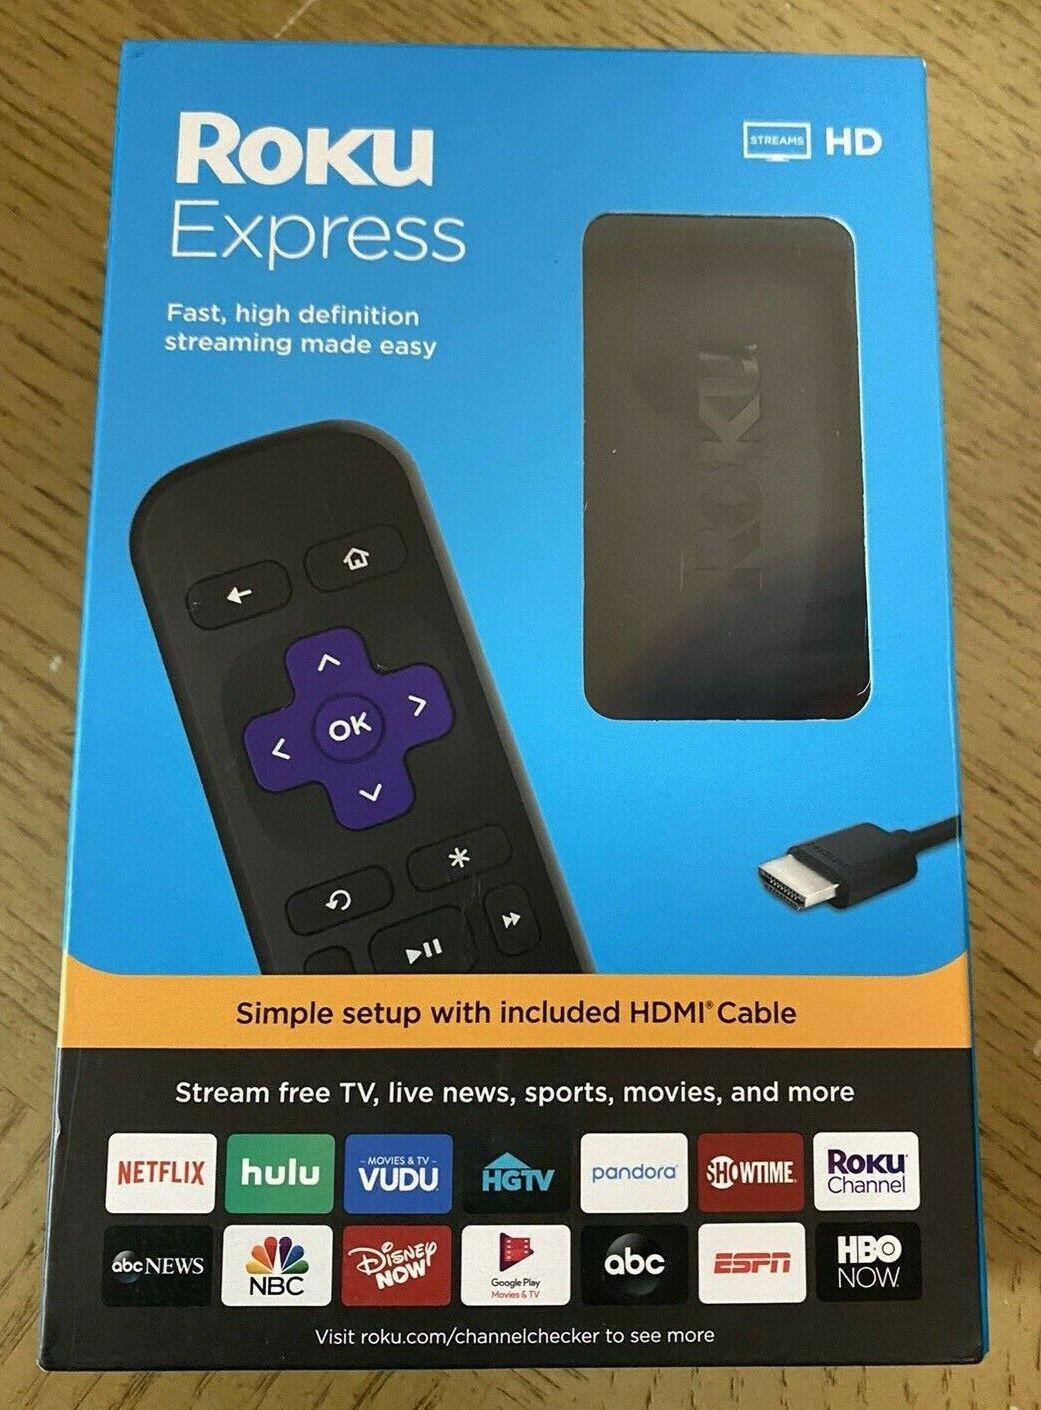 Roku Express HD Streaming Media Player 2019 Model - 3930R  high definition definition express media model player roku streaming